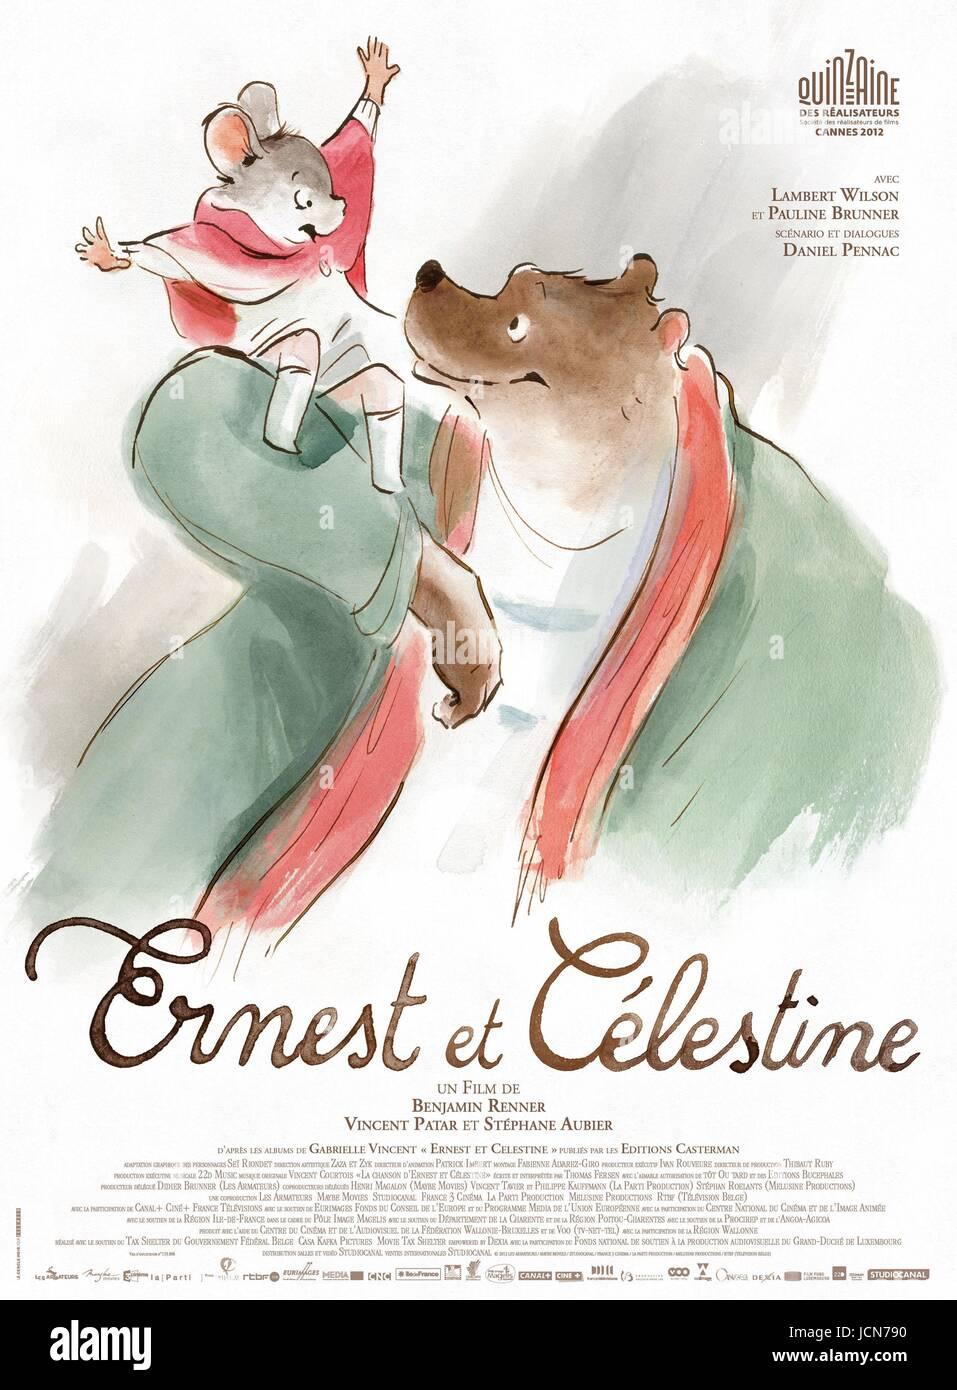 Ernest et Celestine - Stock Image